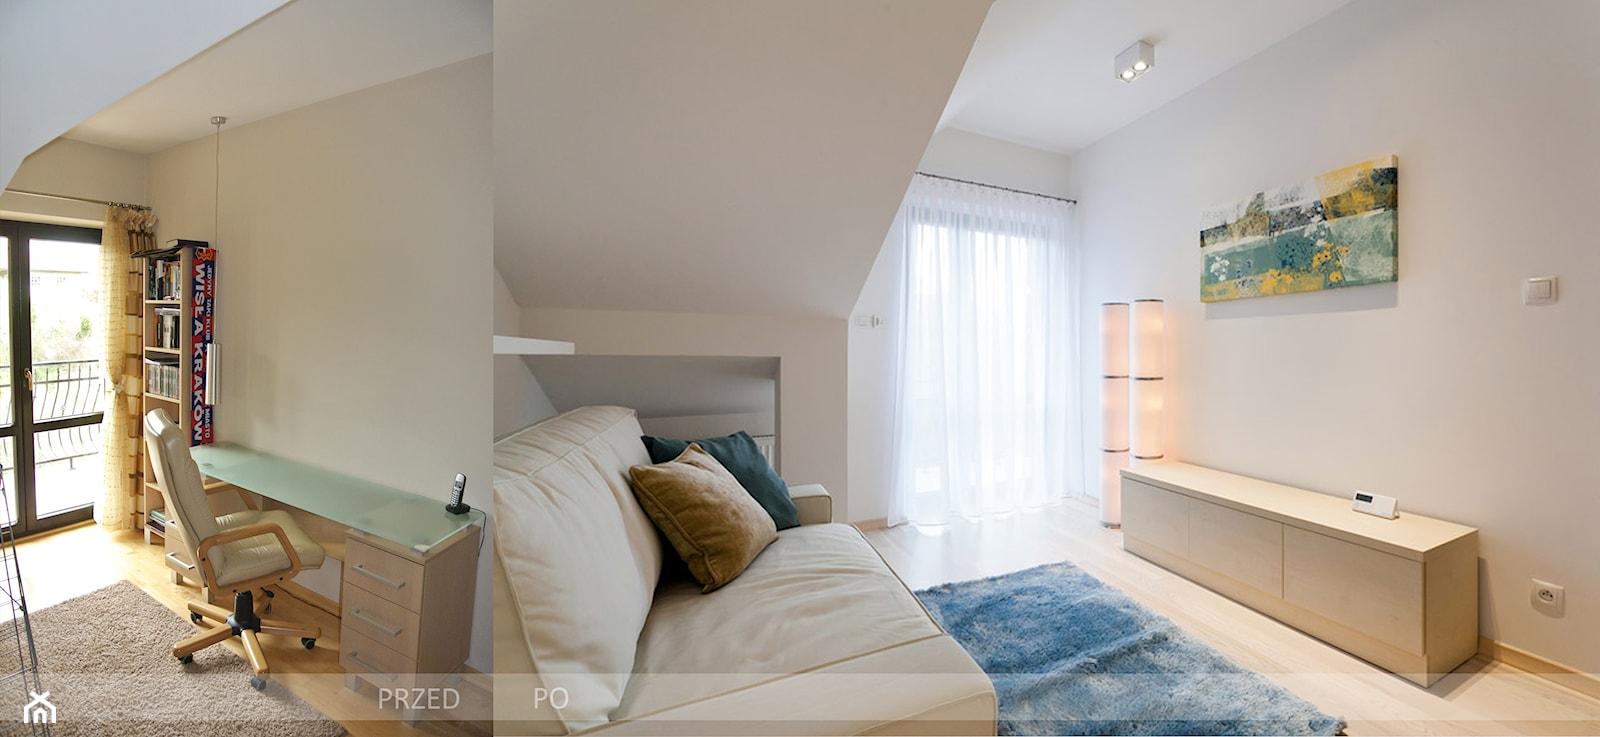 Pokój gościnny - zdjęcie od Lidia Sarad - Homebook